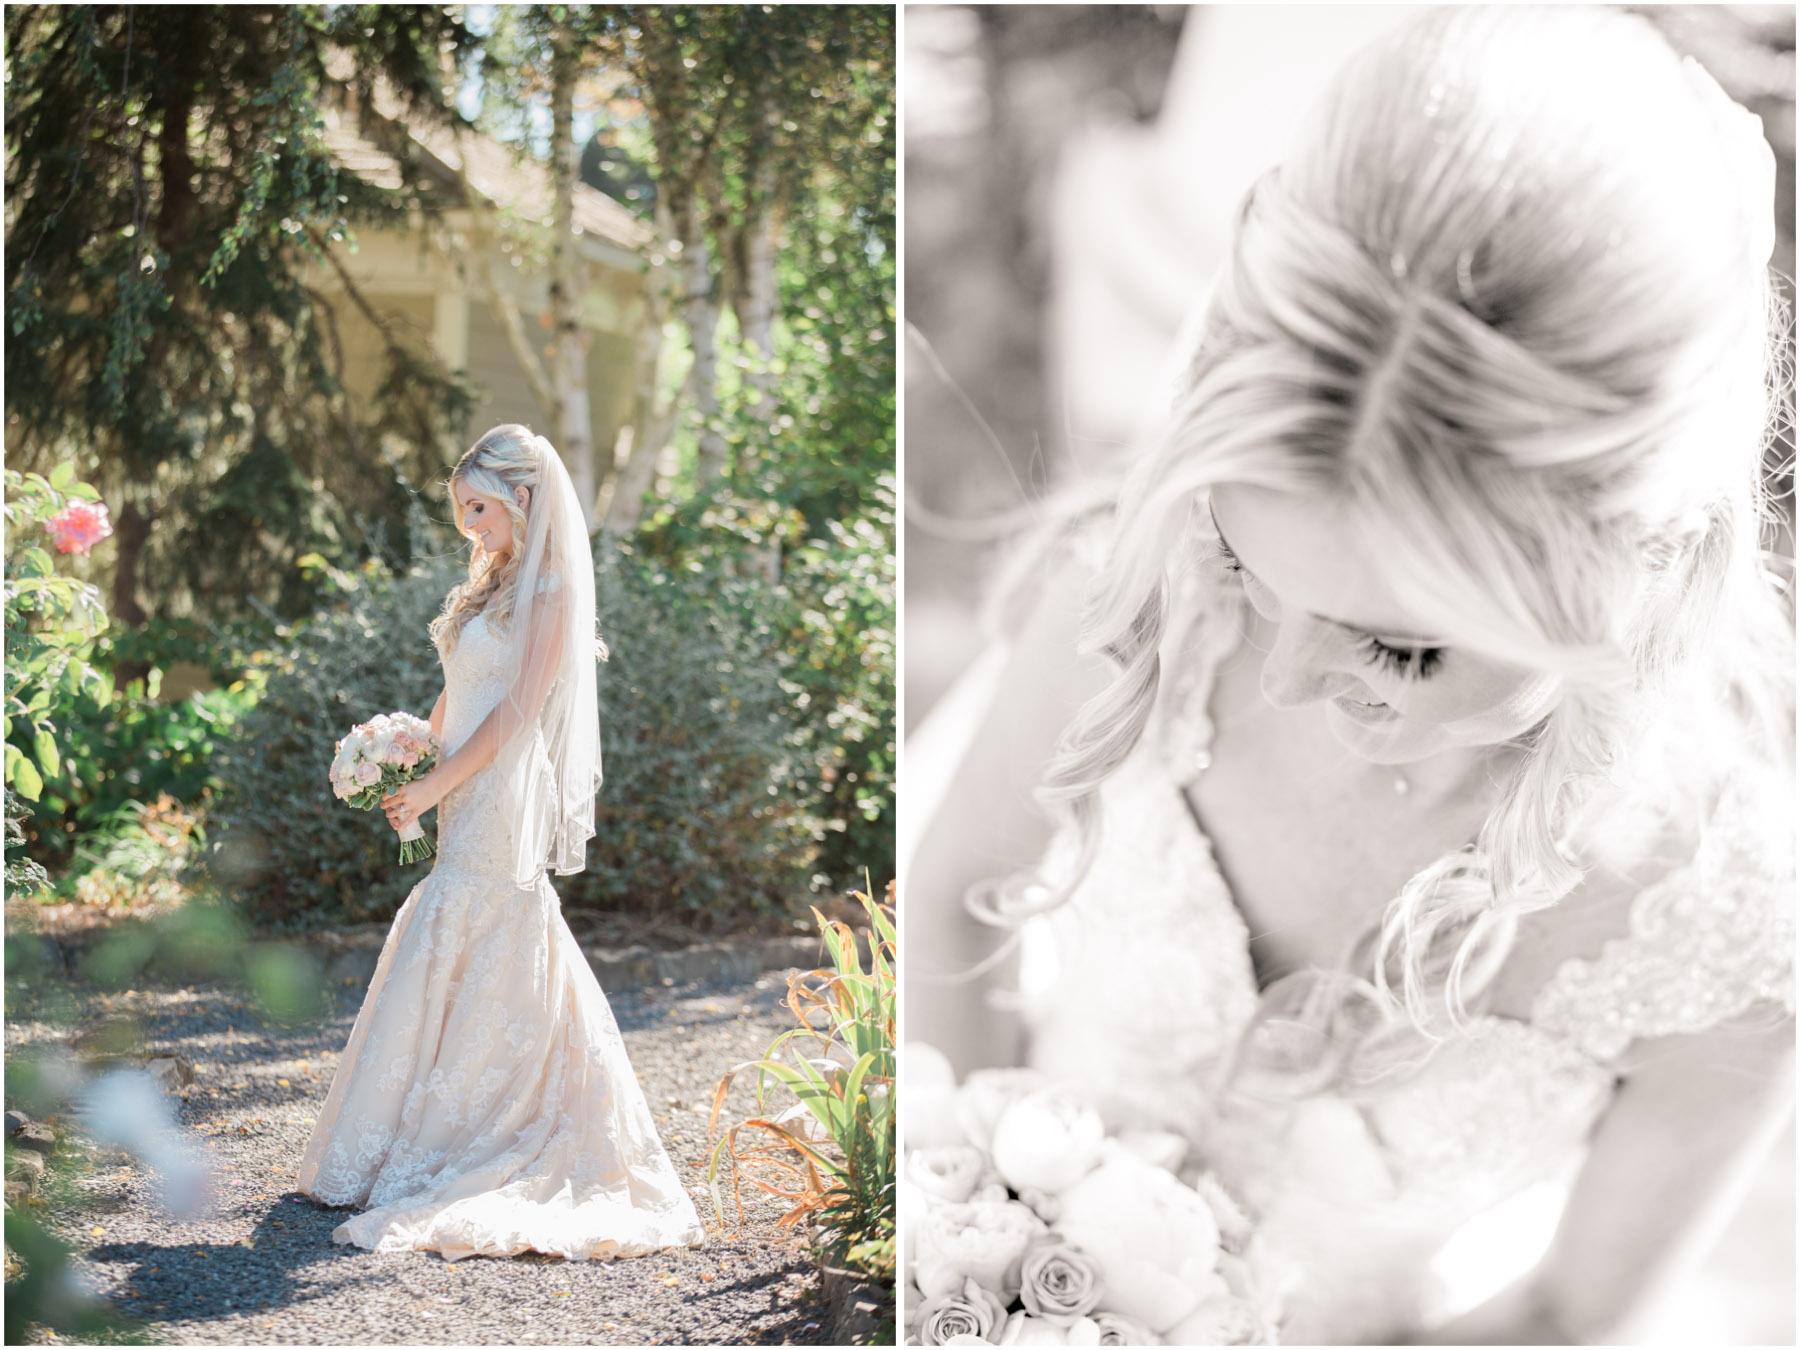 JennaBethPhotography-NTWedding-29.jpg